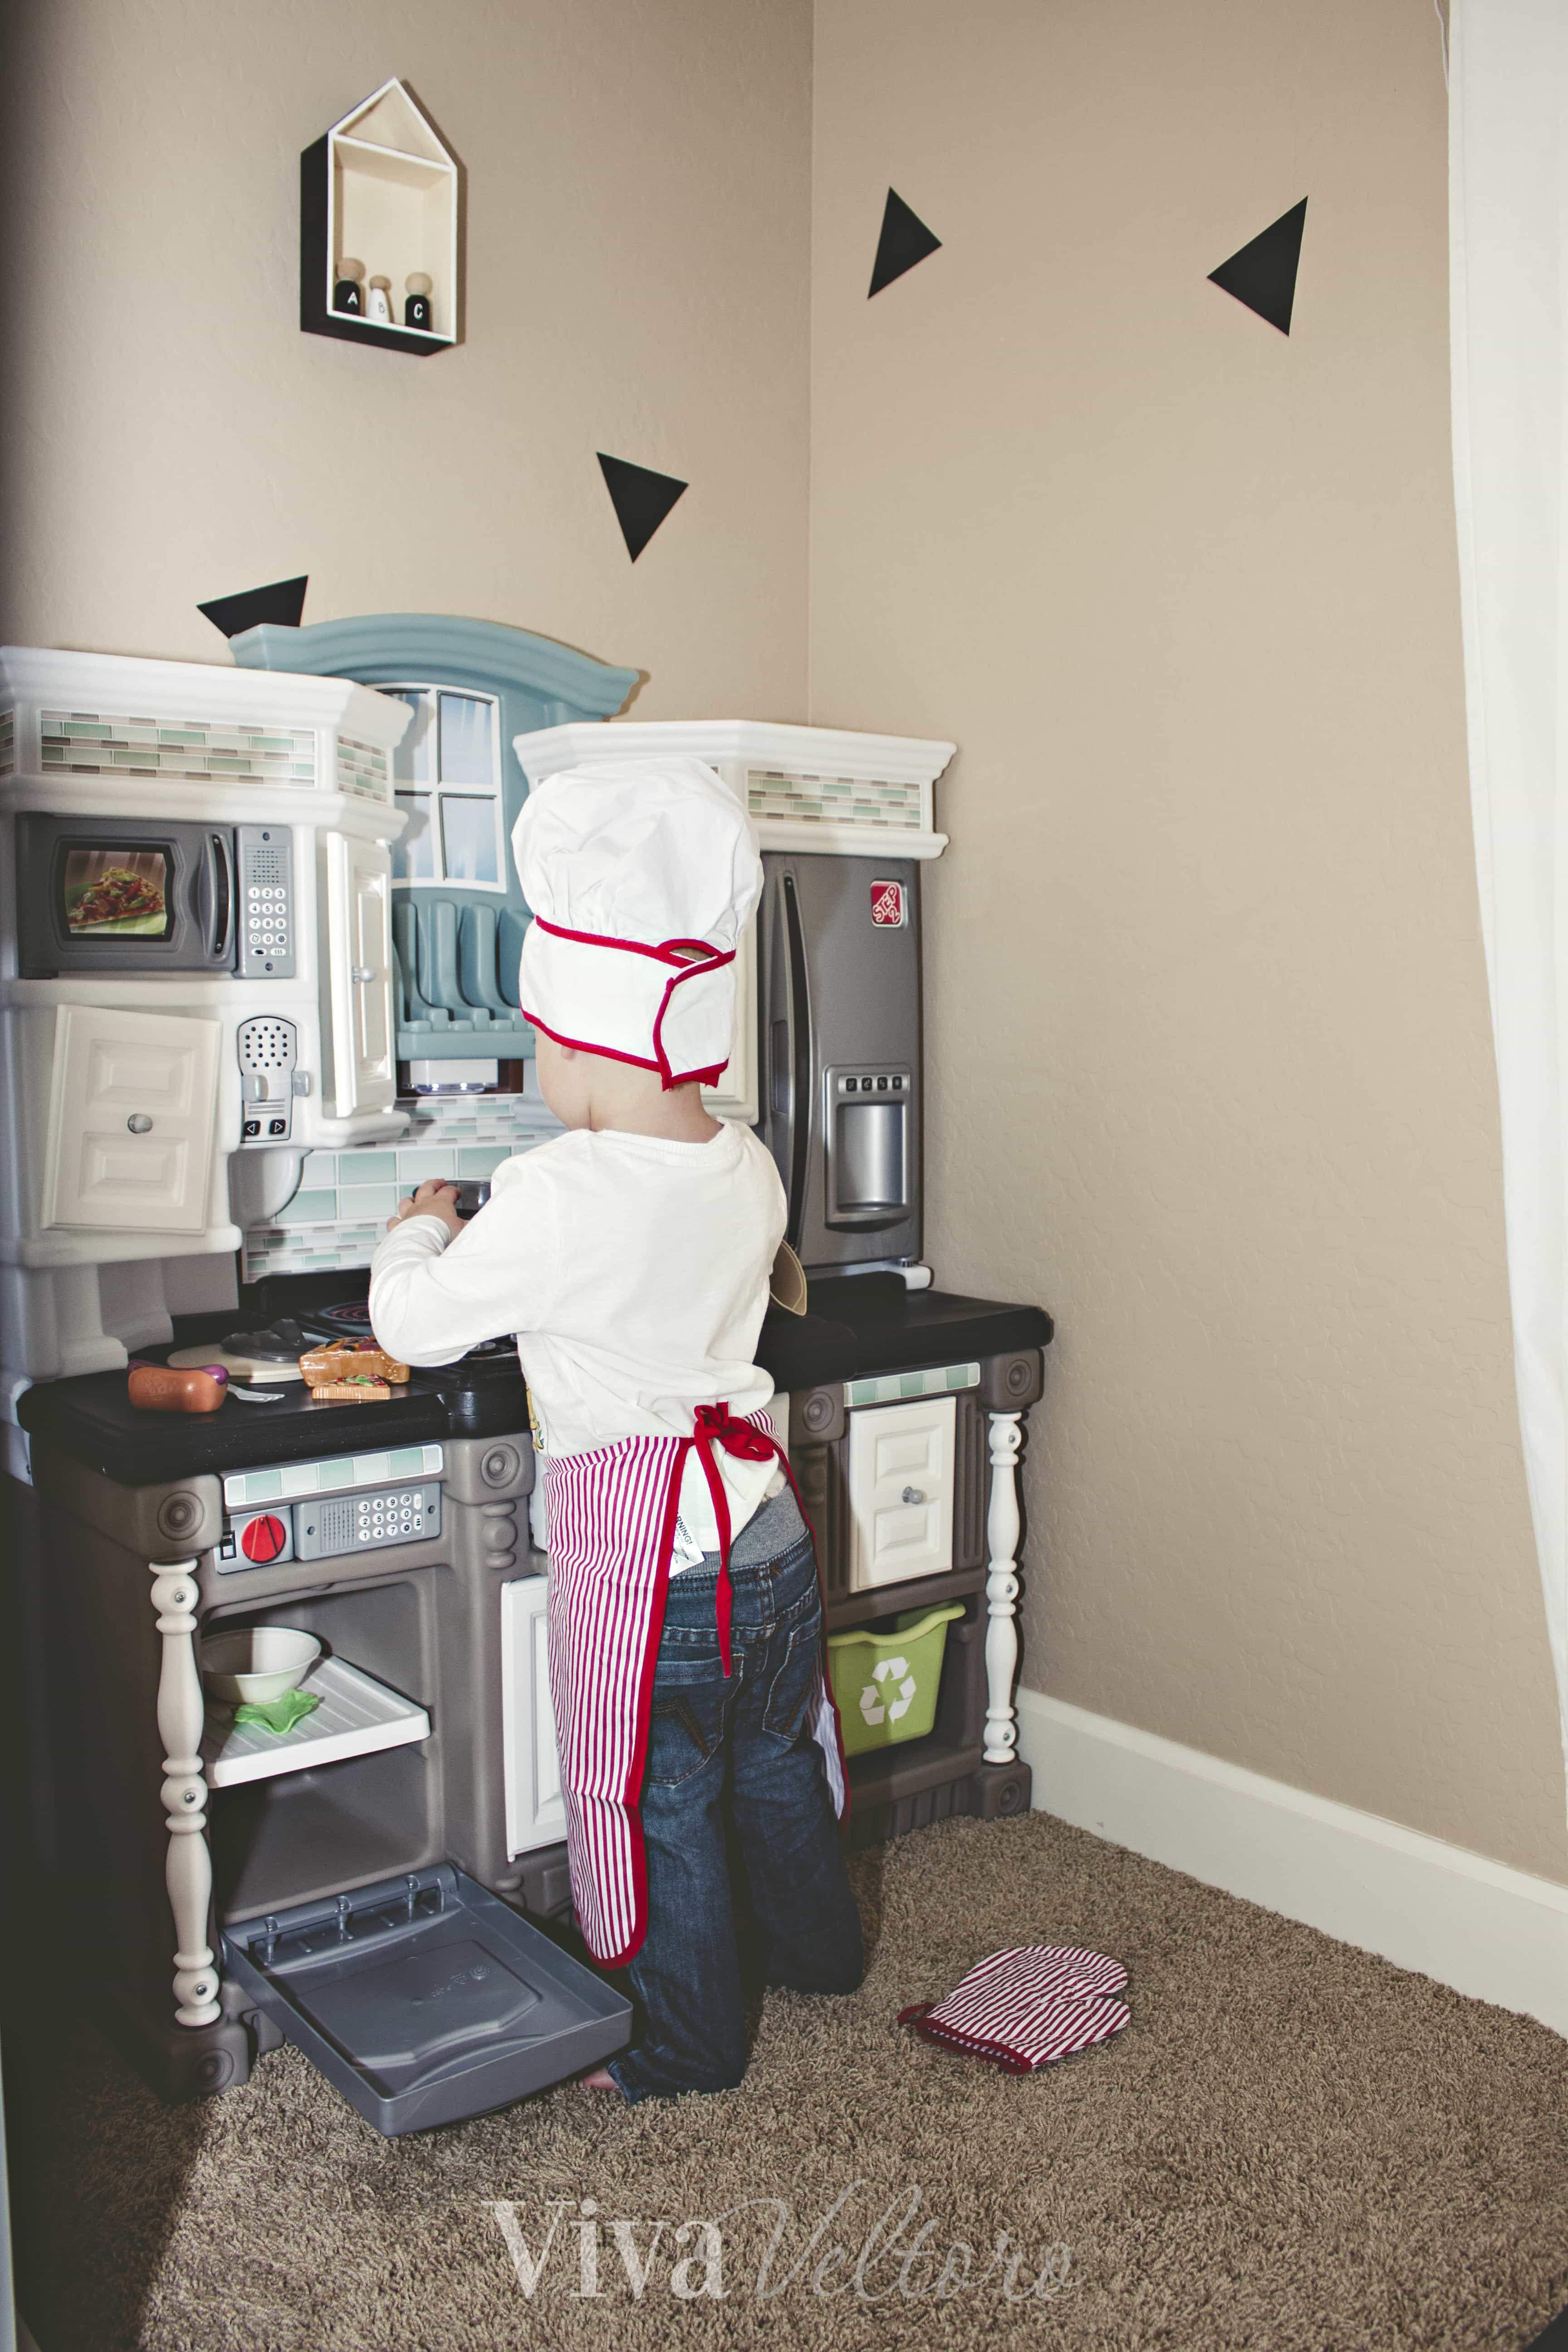 Step2 LifeStyle Dream Kitchen Review - Viva Veltoro